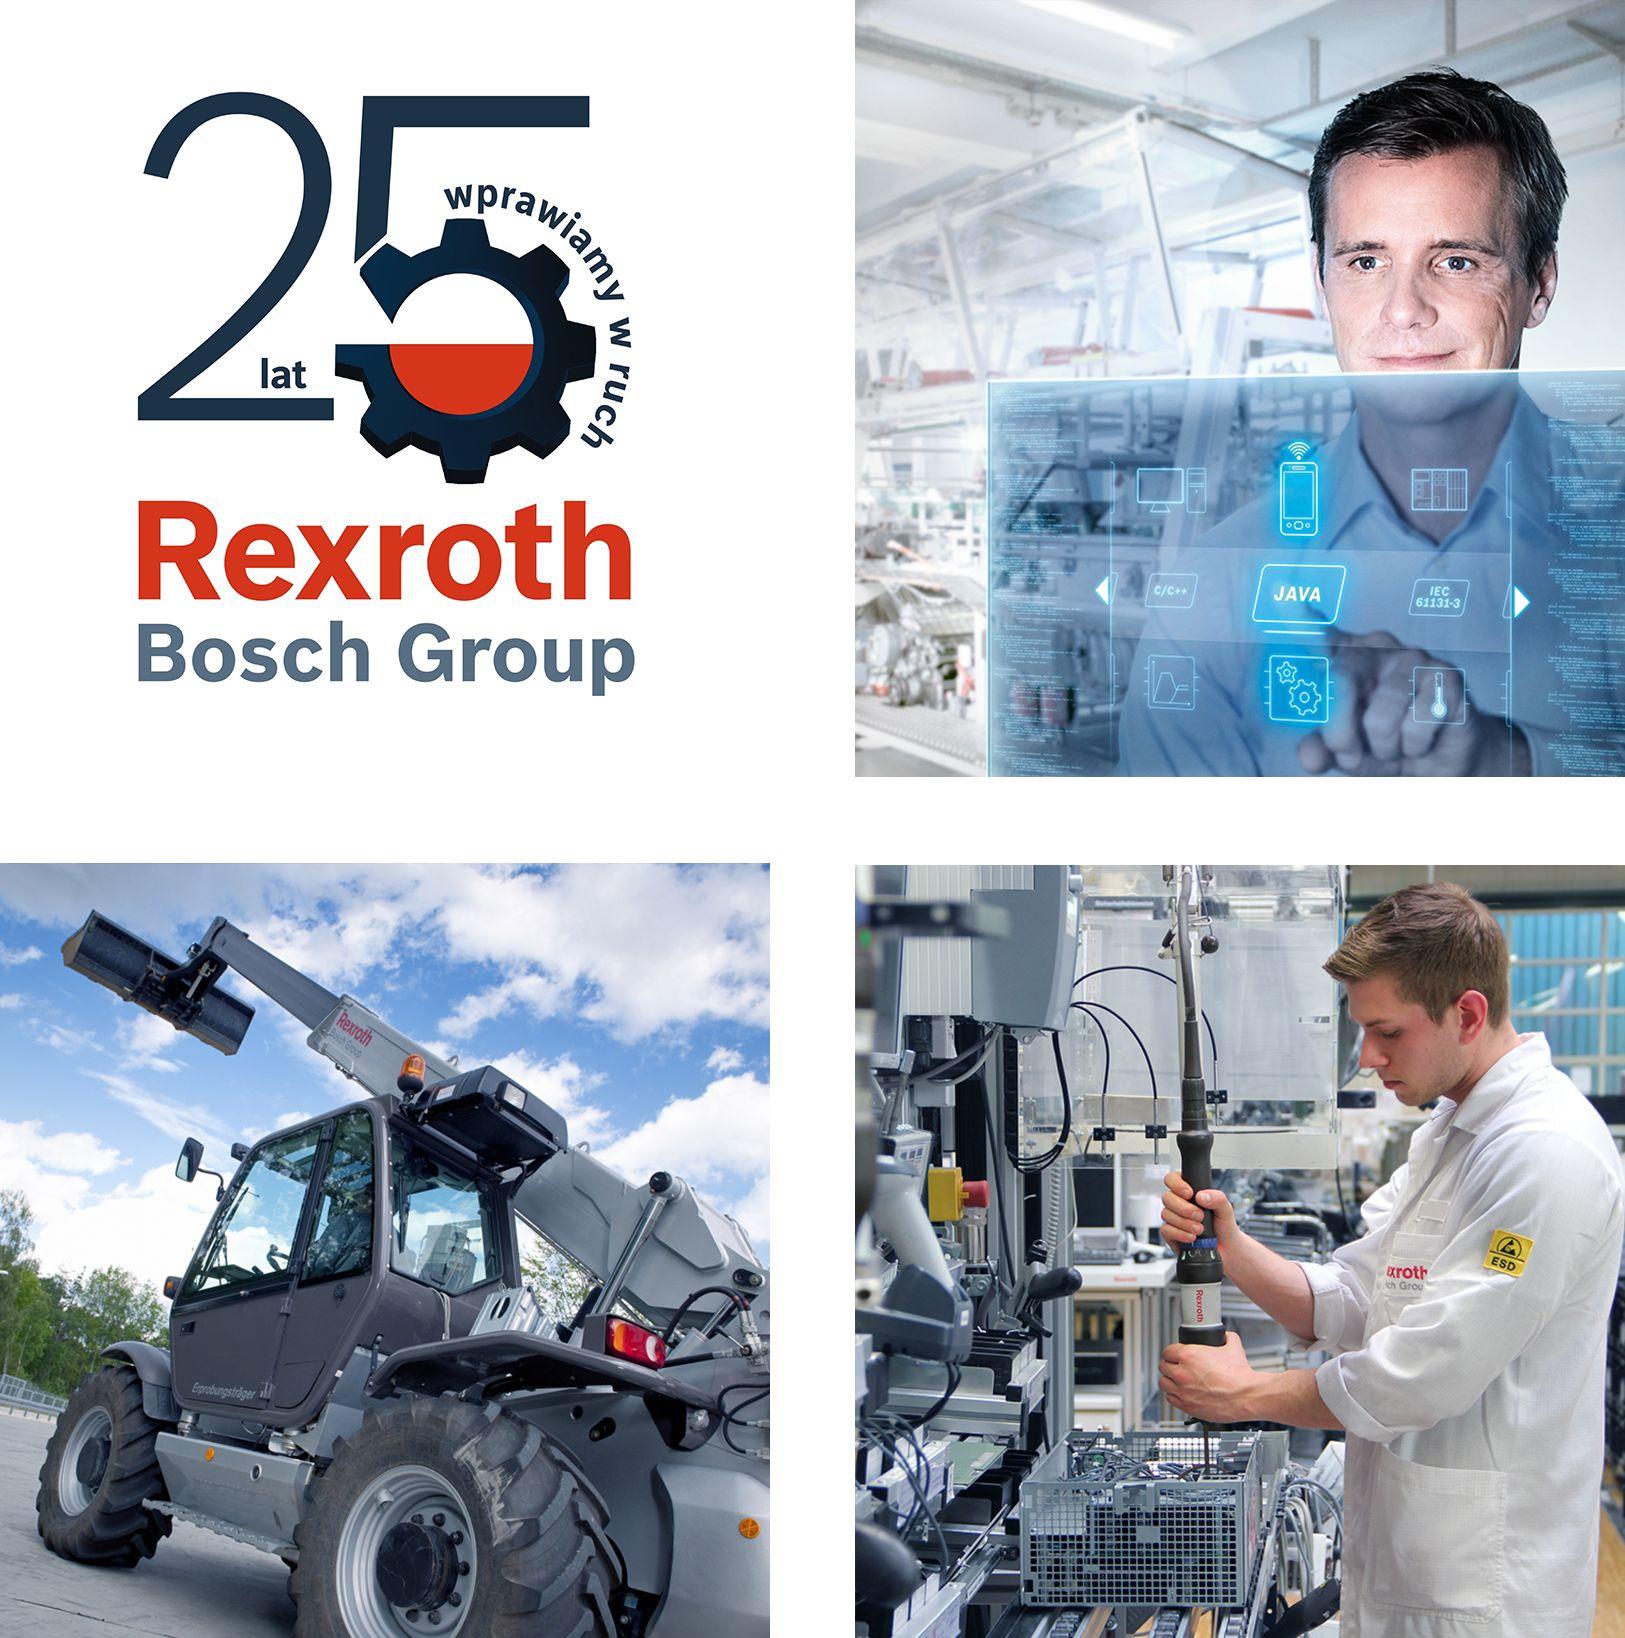 Od 25 lat wprawiamy w ruch 25-lecie firmy Bosch Rexroth w Polsce